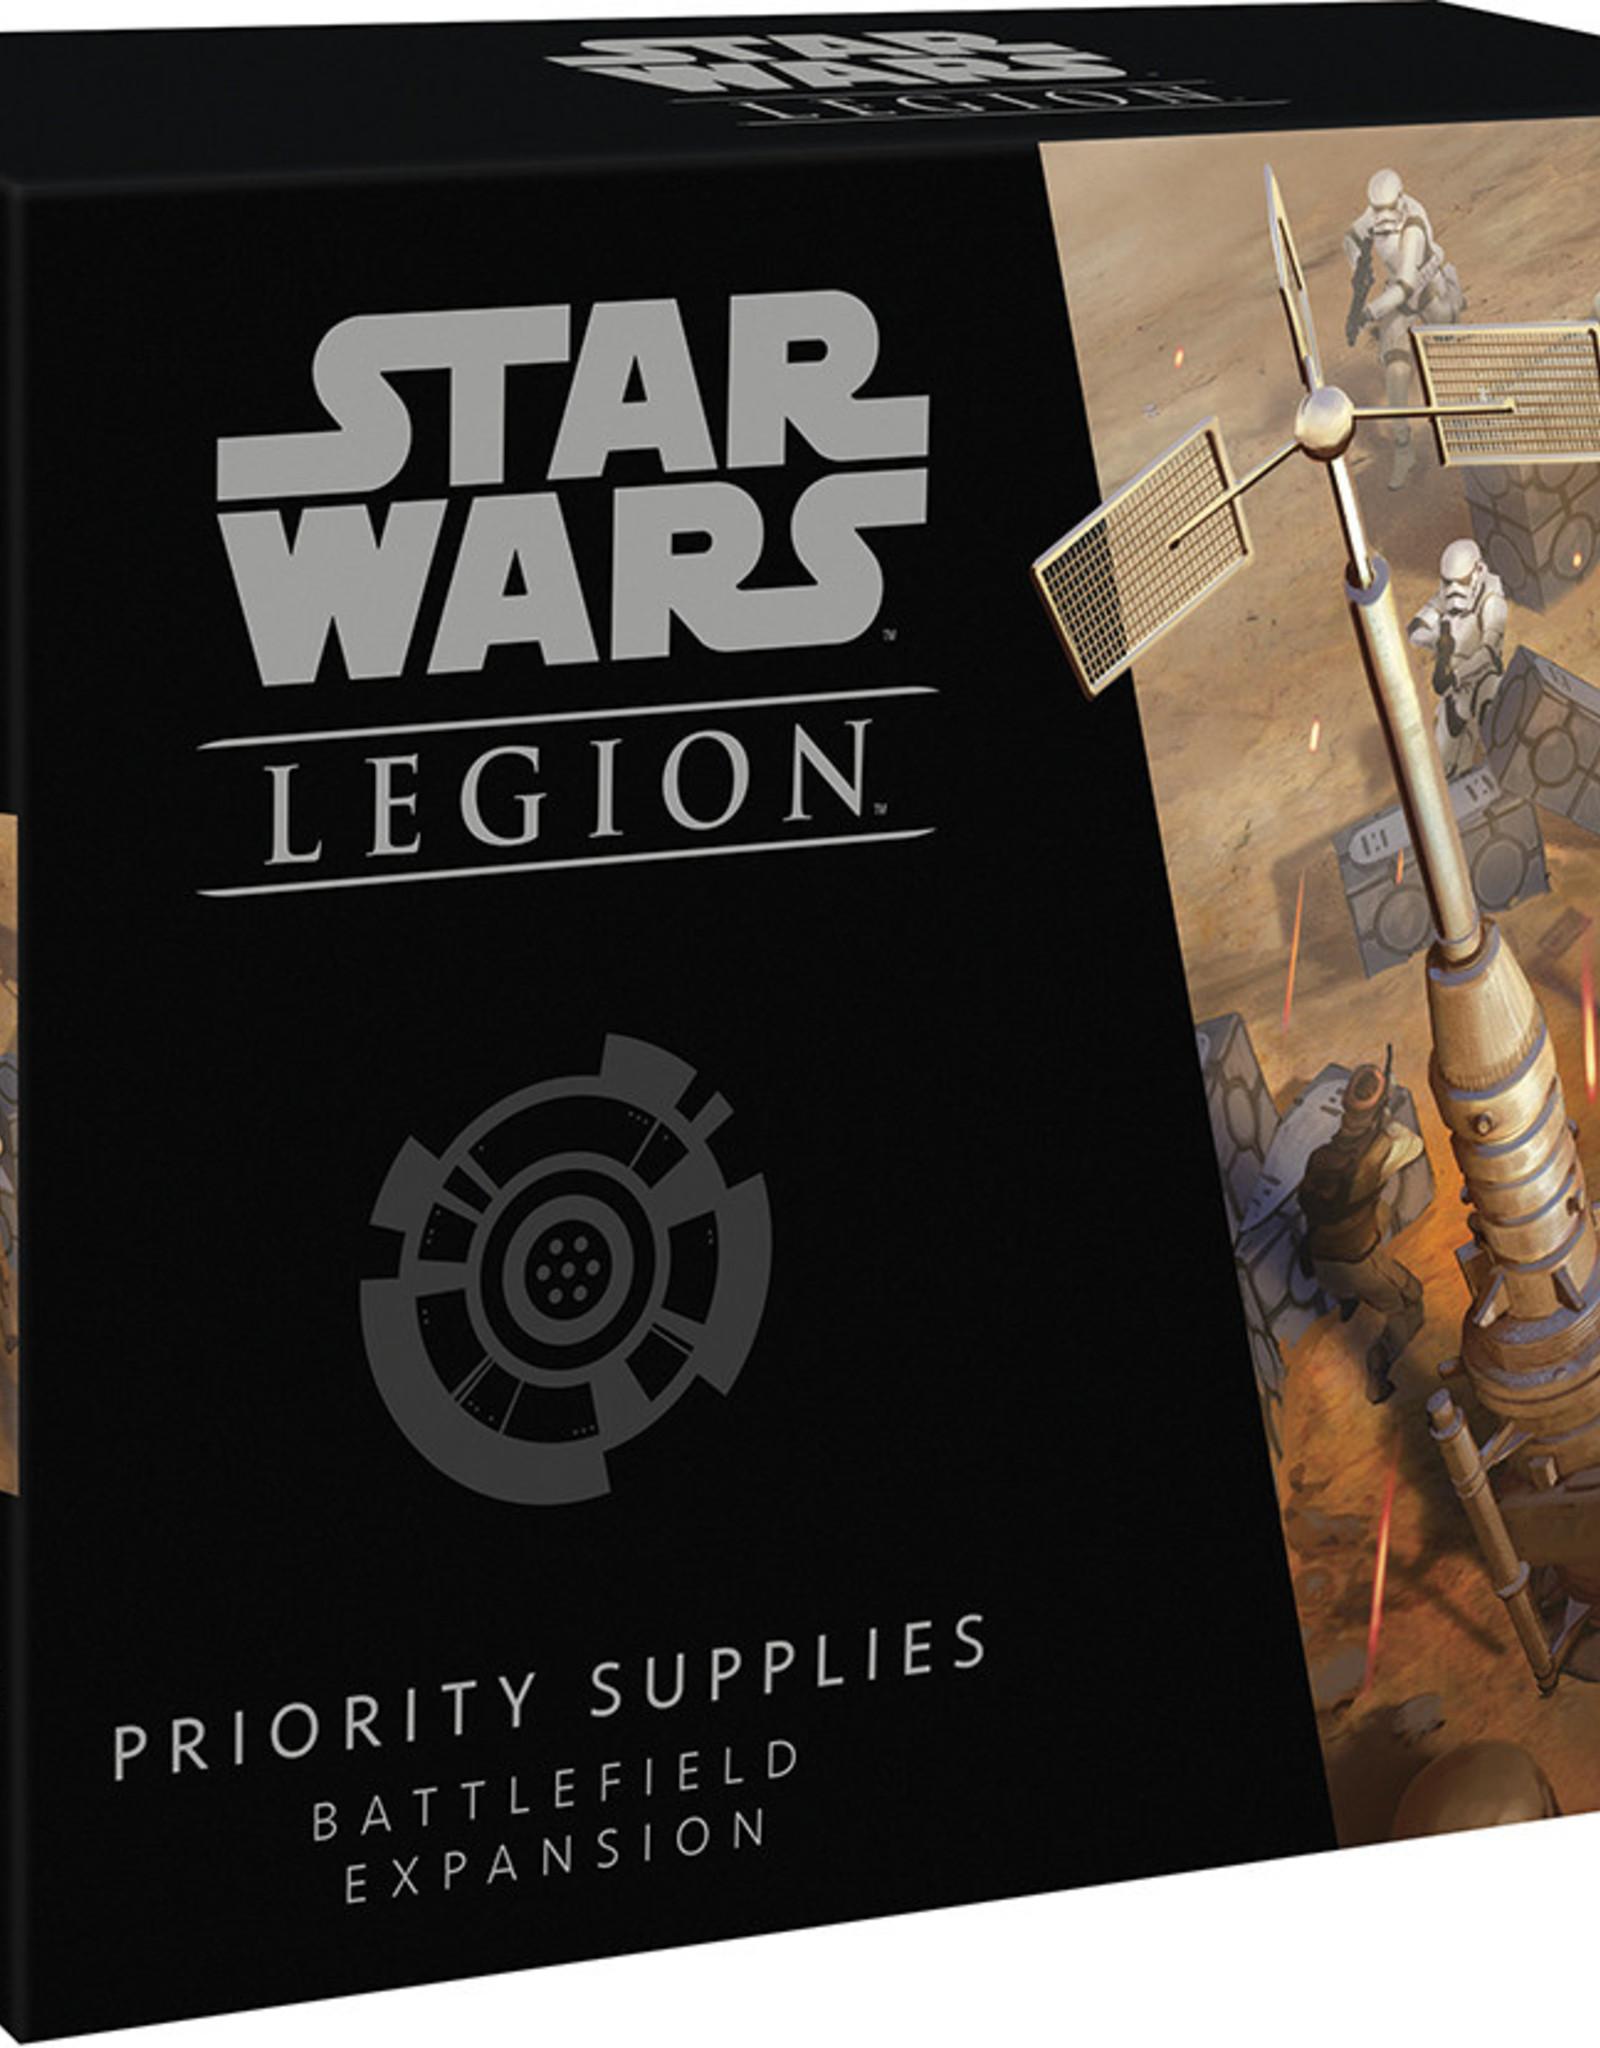 Priority Supplie Battlefield Expansion